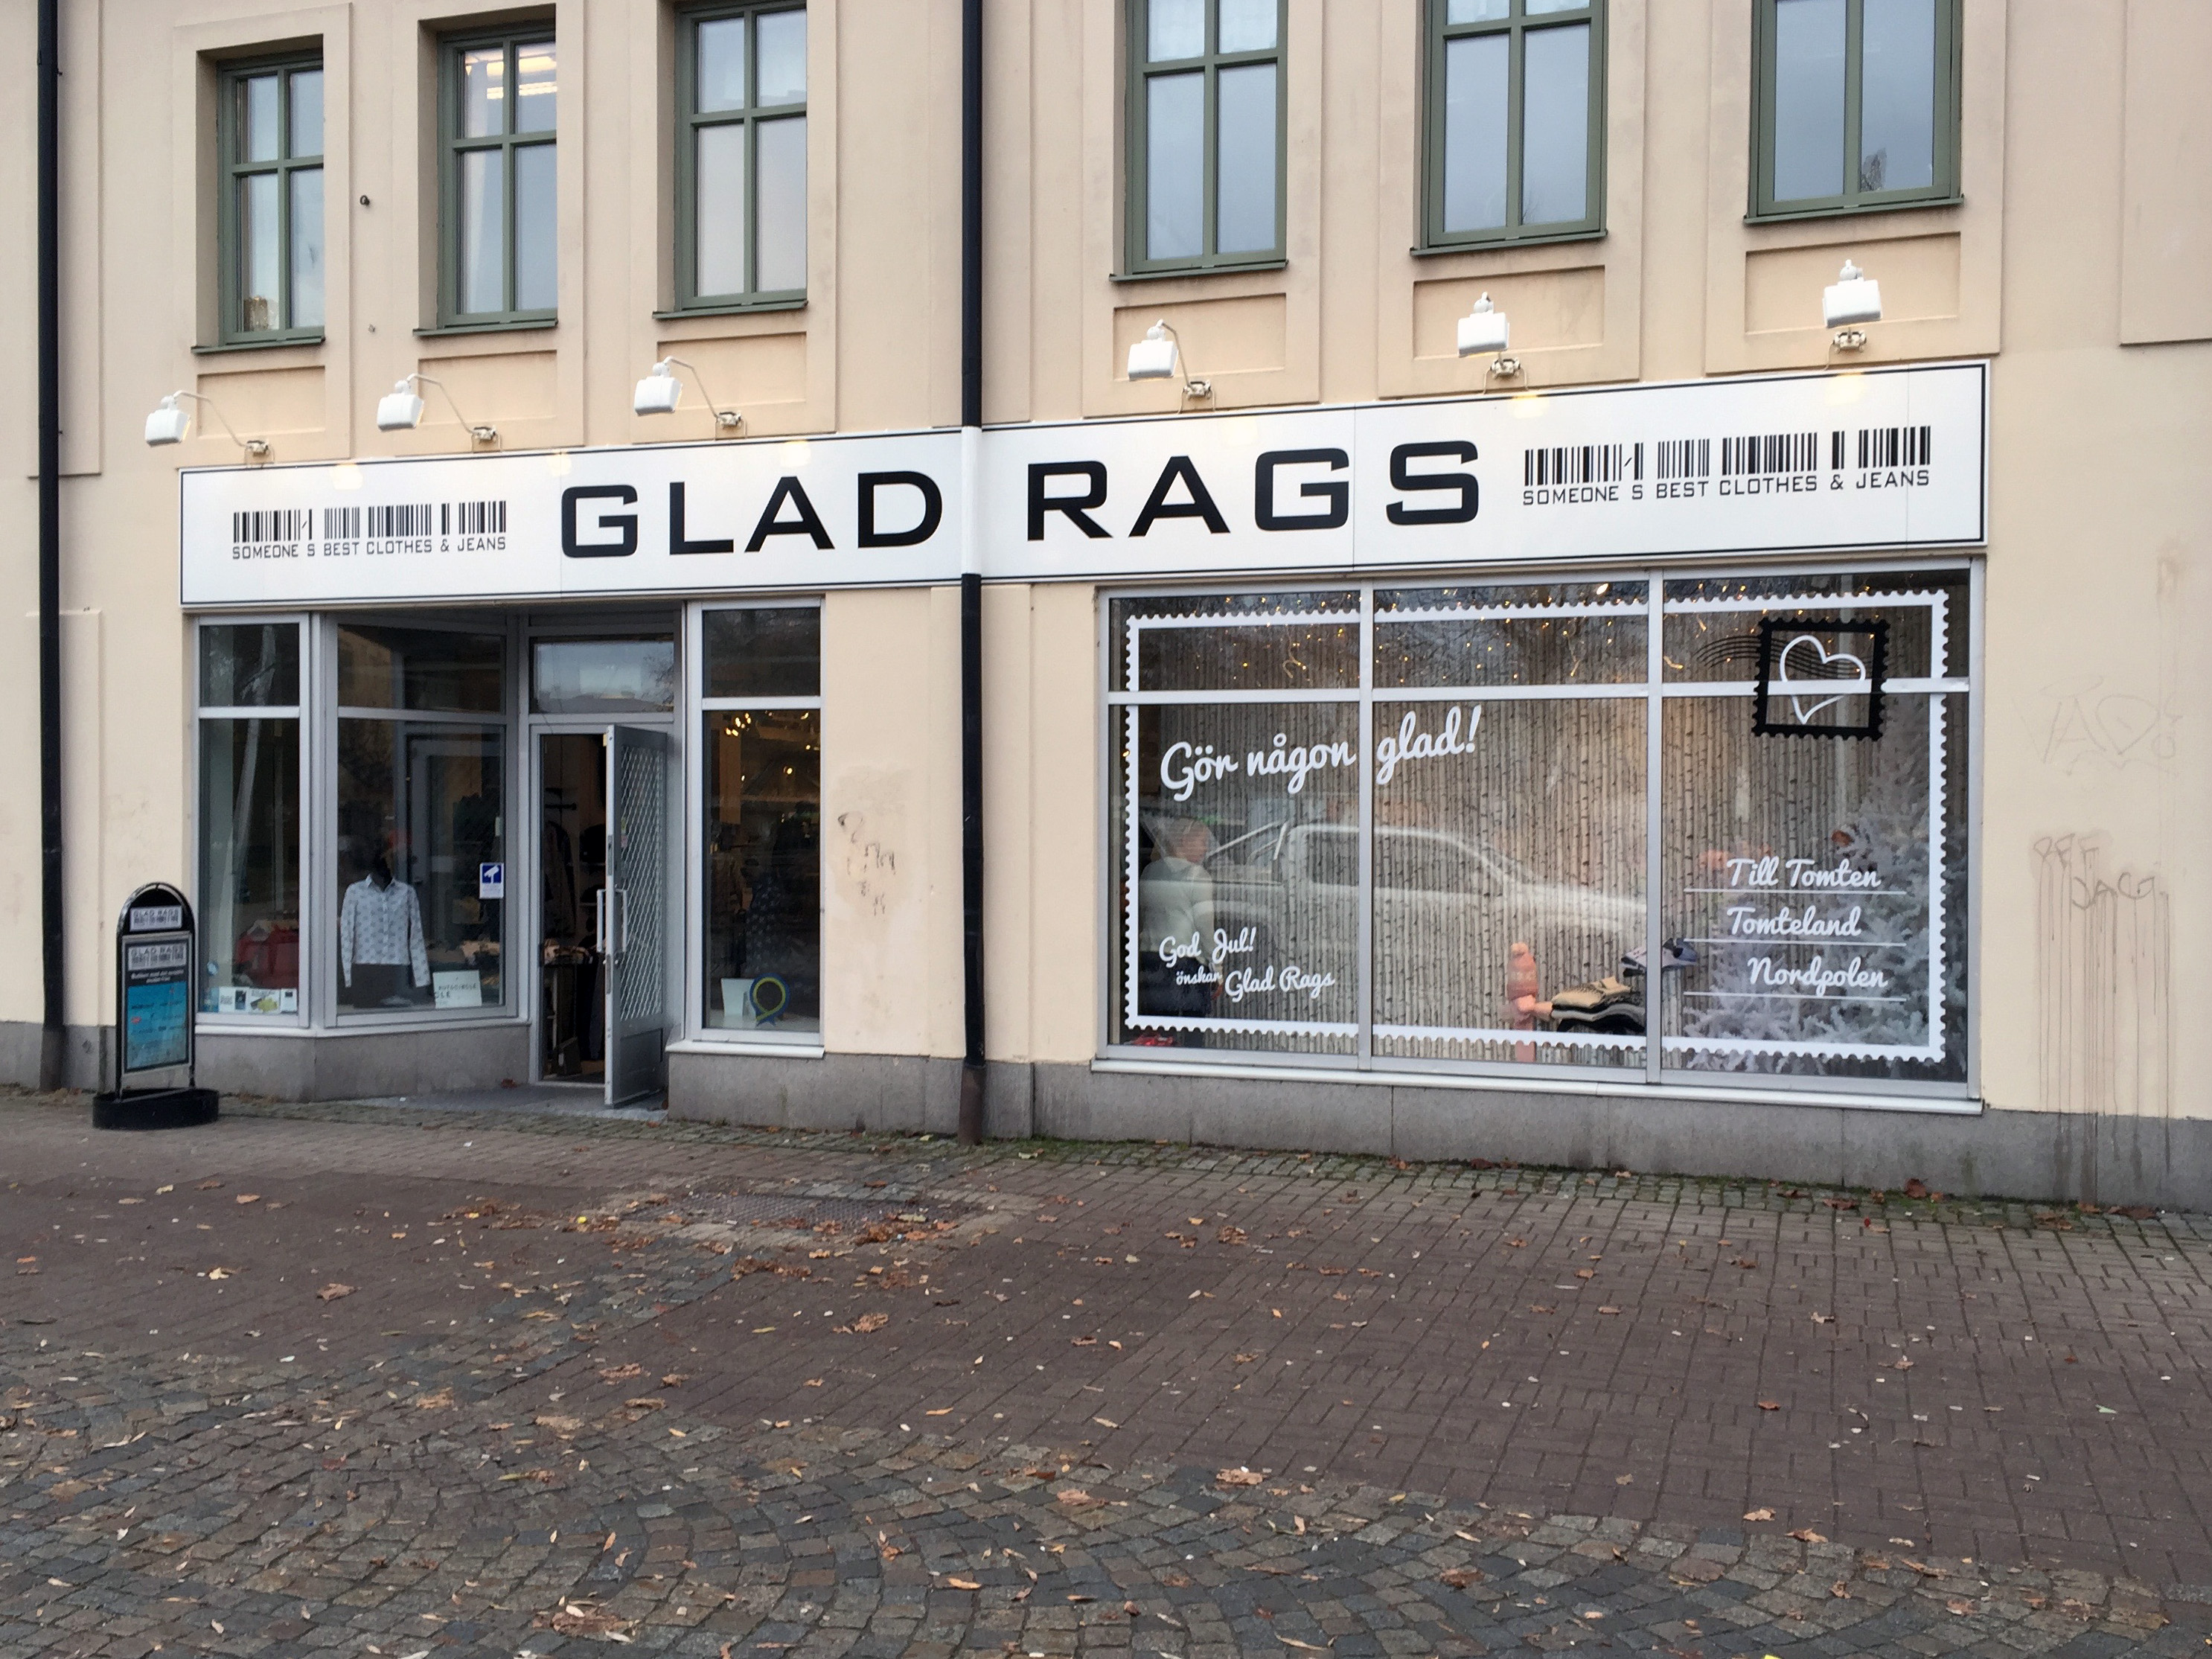 Skylt samt skyltfönster klädbutiken Glad Rags, Katrineholm